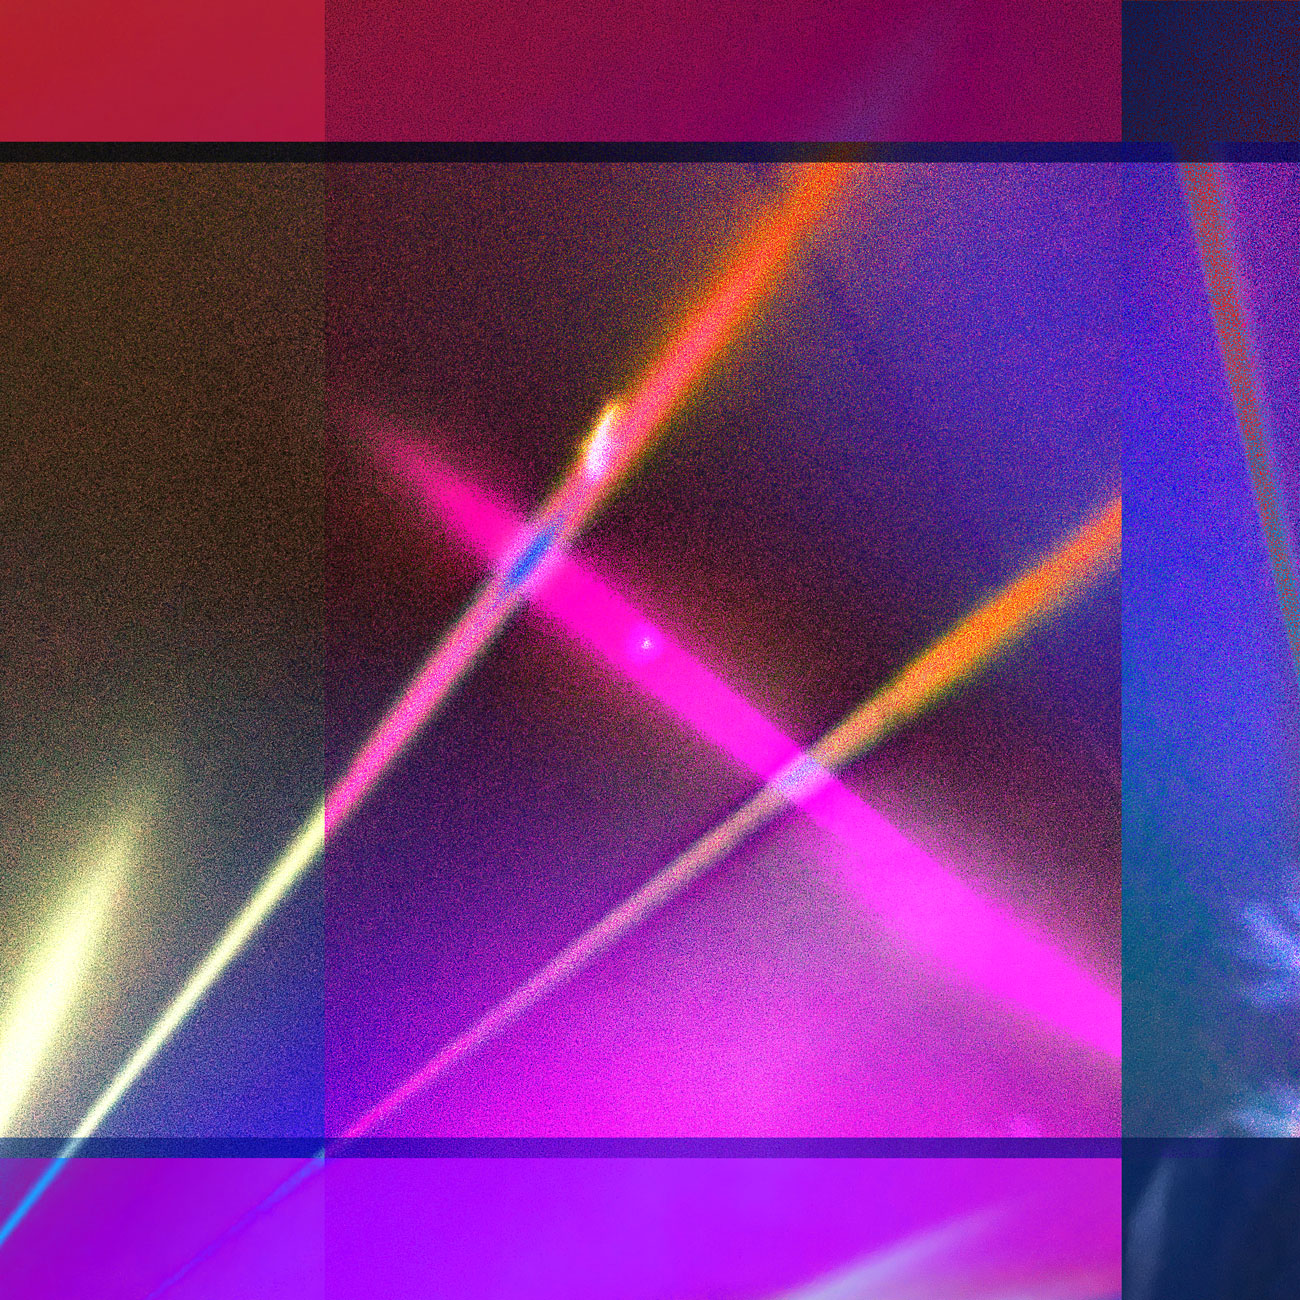 Fifth Light • 90 x 90 cm (35.43 x 35.43 in)